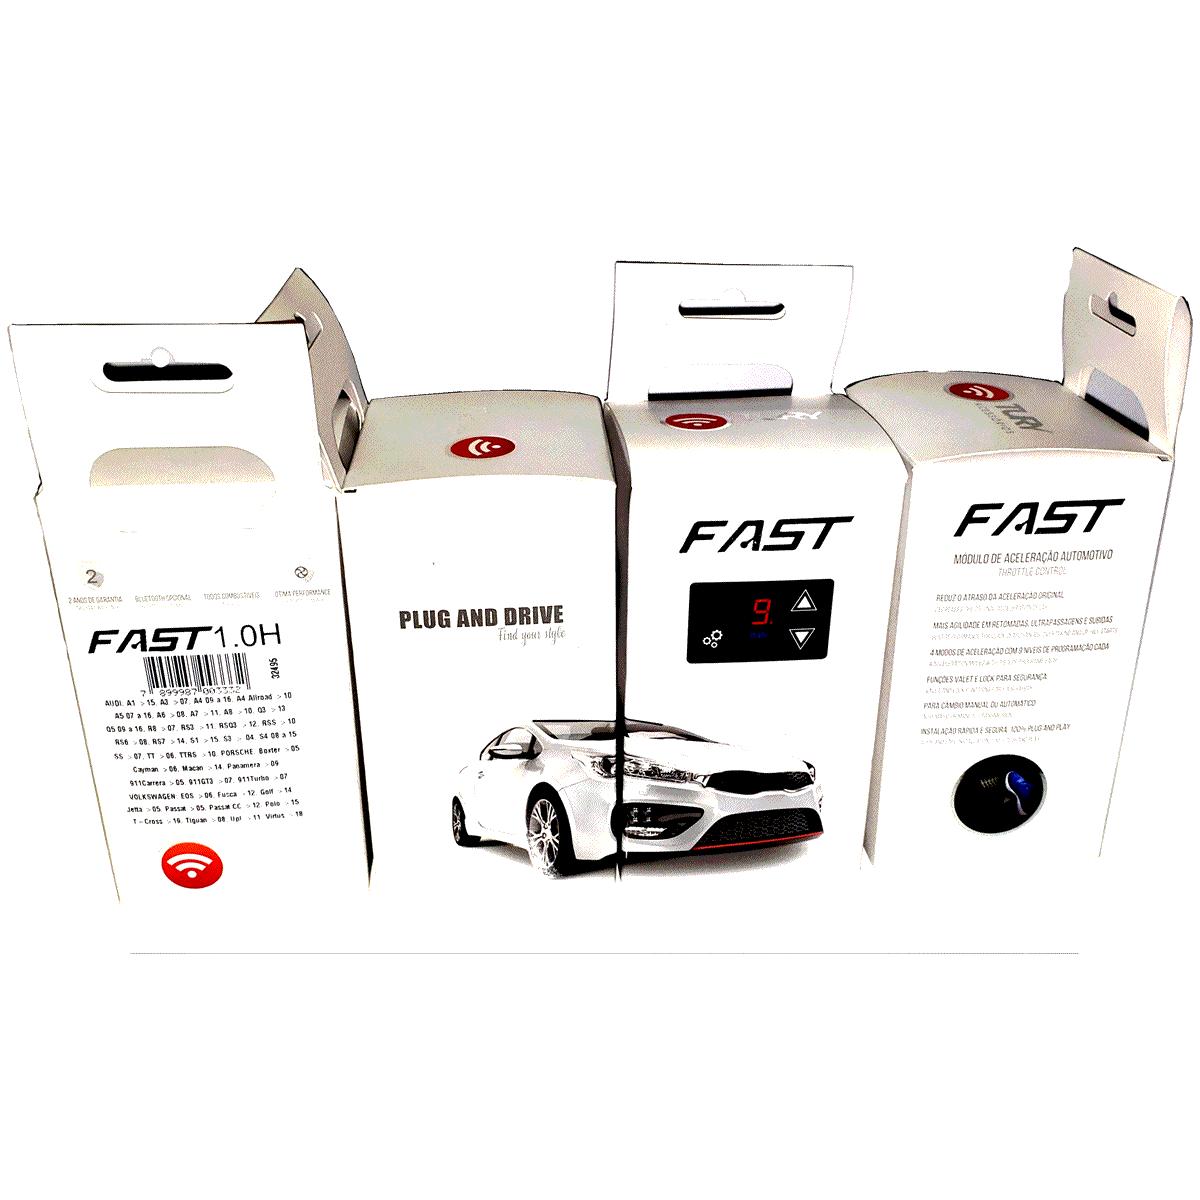 Fast 1.0 AD Volvo Módulo Acelerador Plug & Play